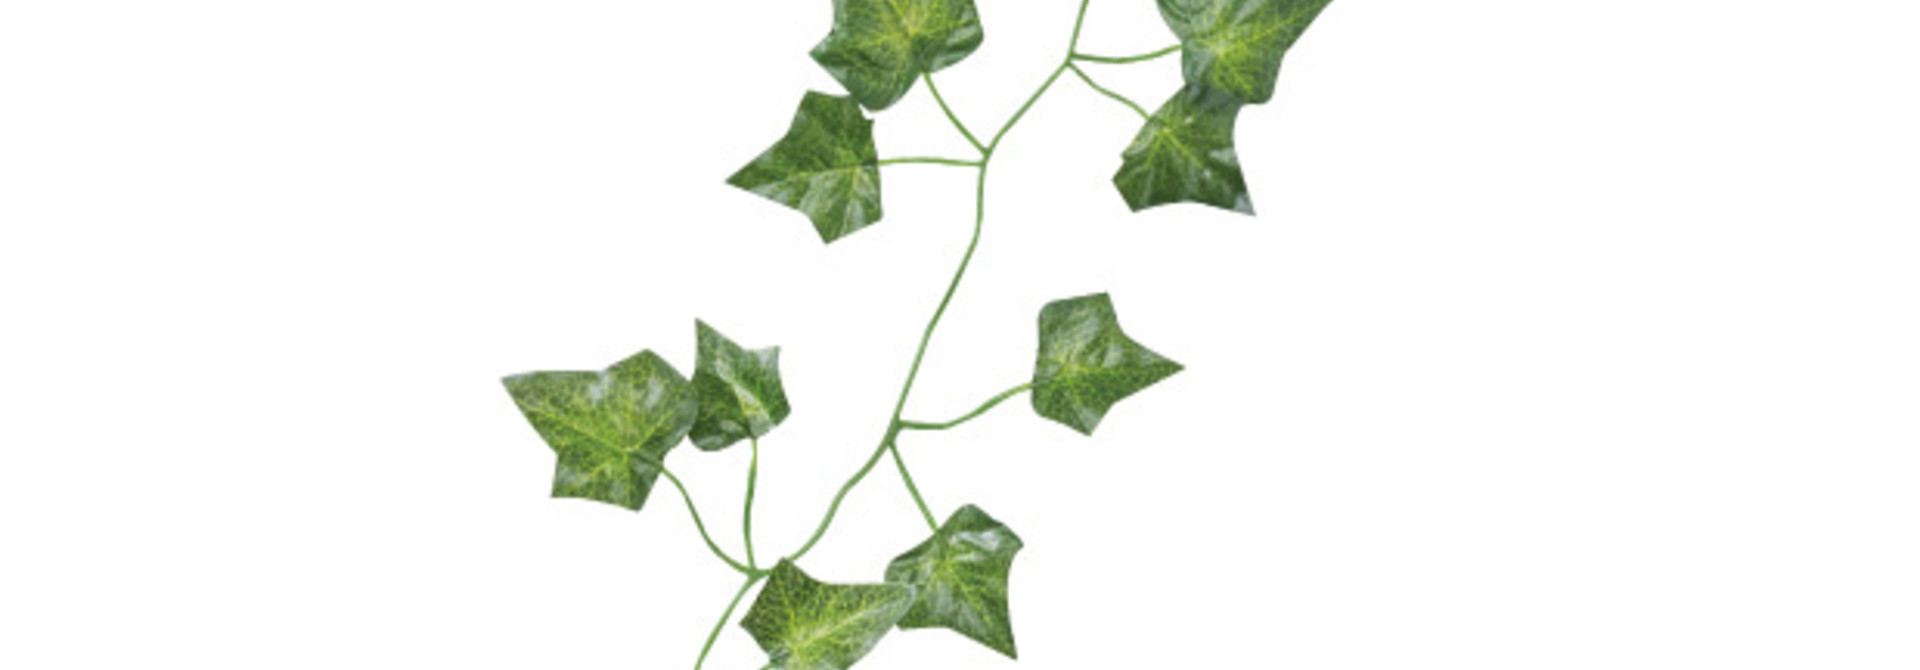 Decoratieve klimop 2m (5 st) Beautiful Botanics Ginger Ray